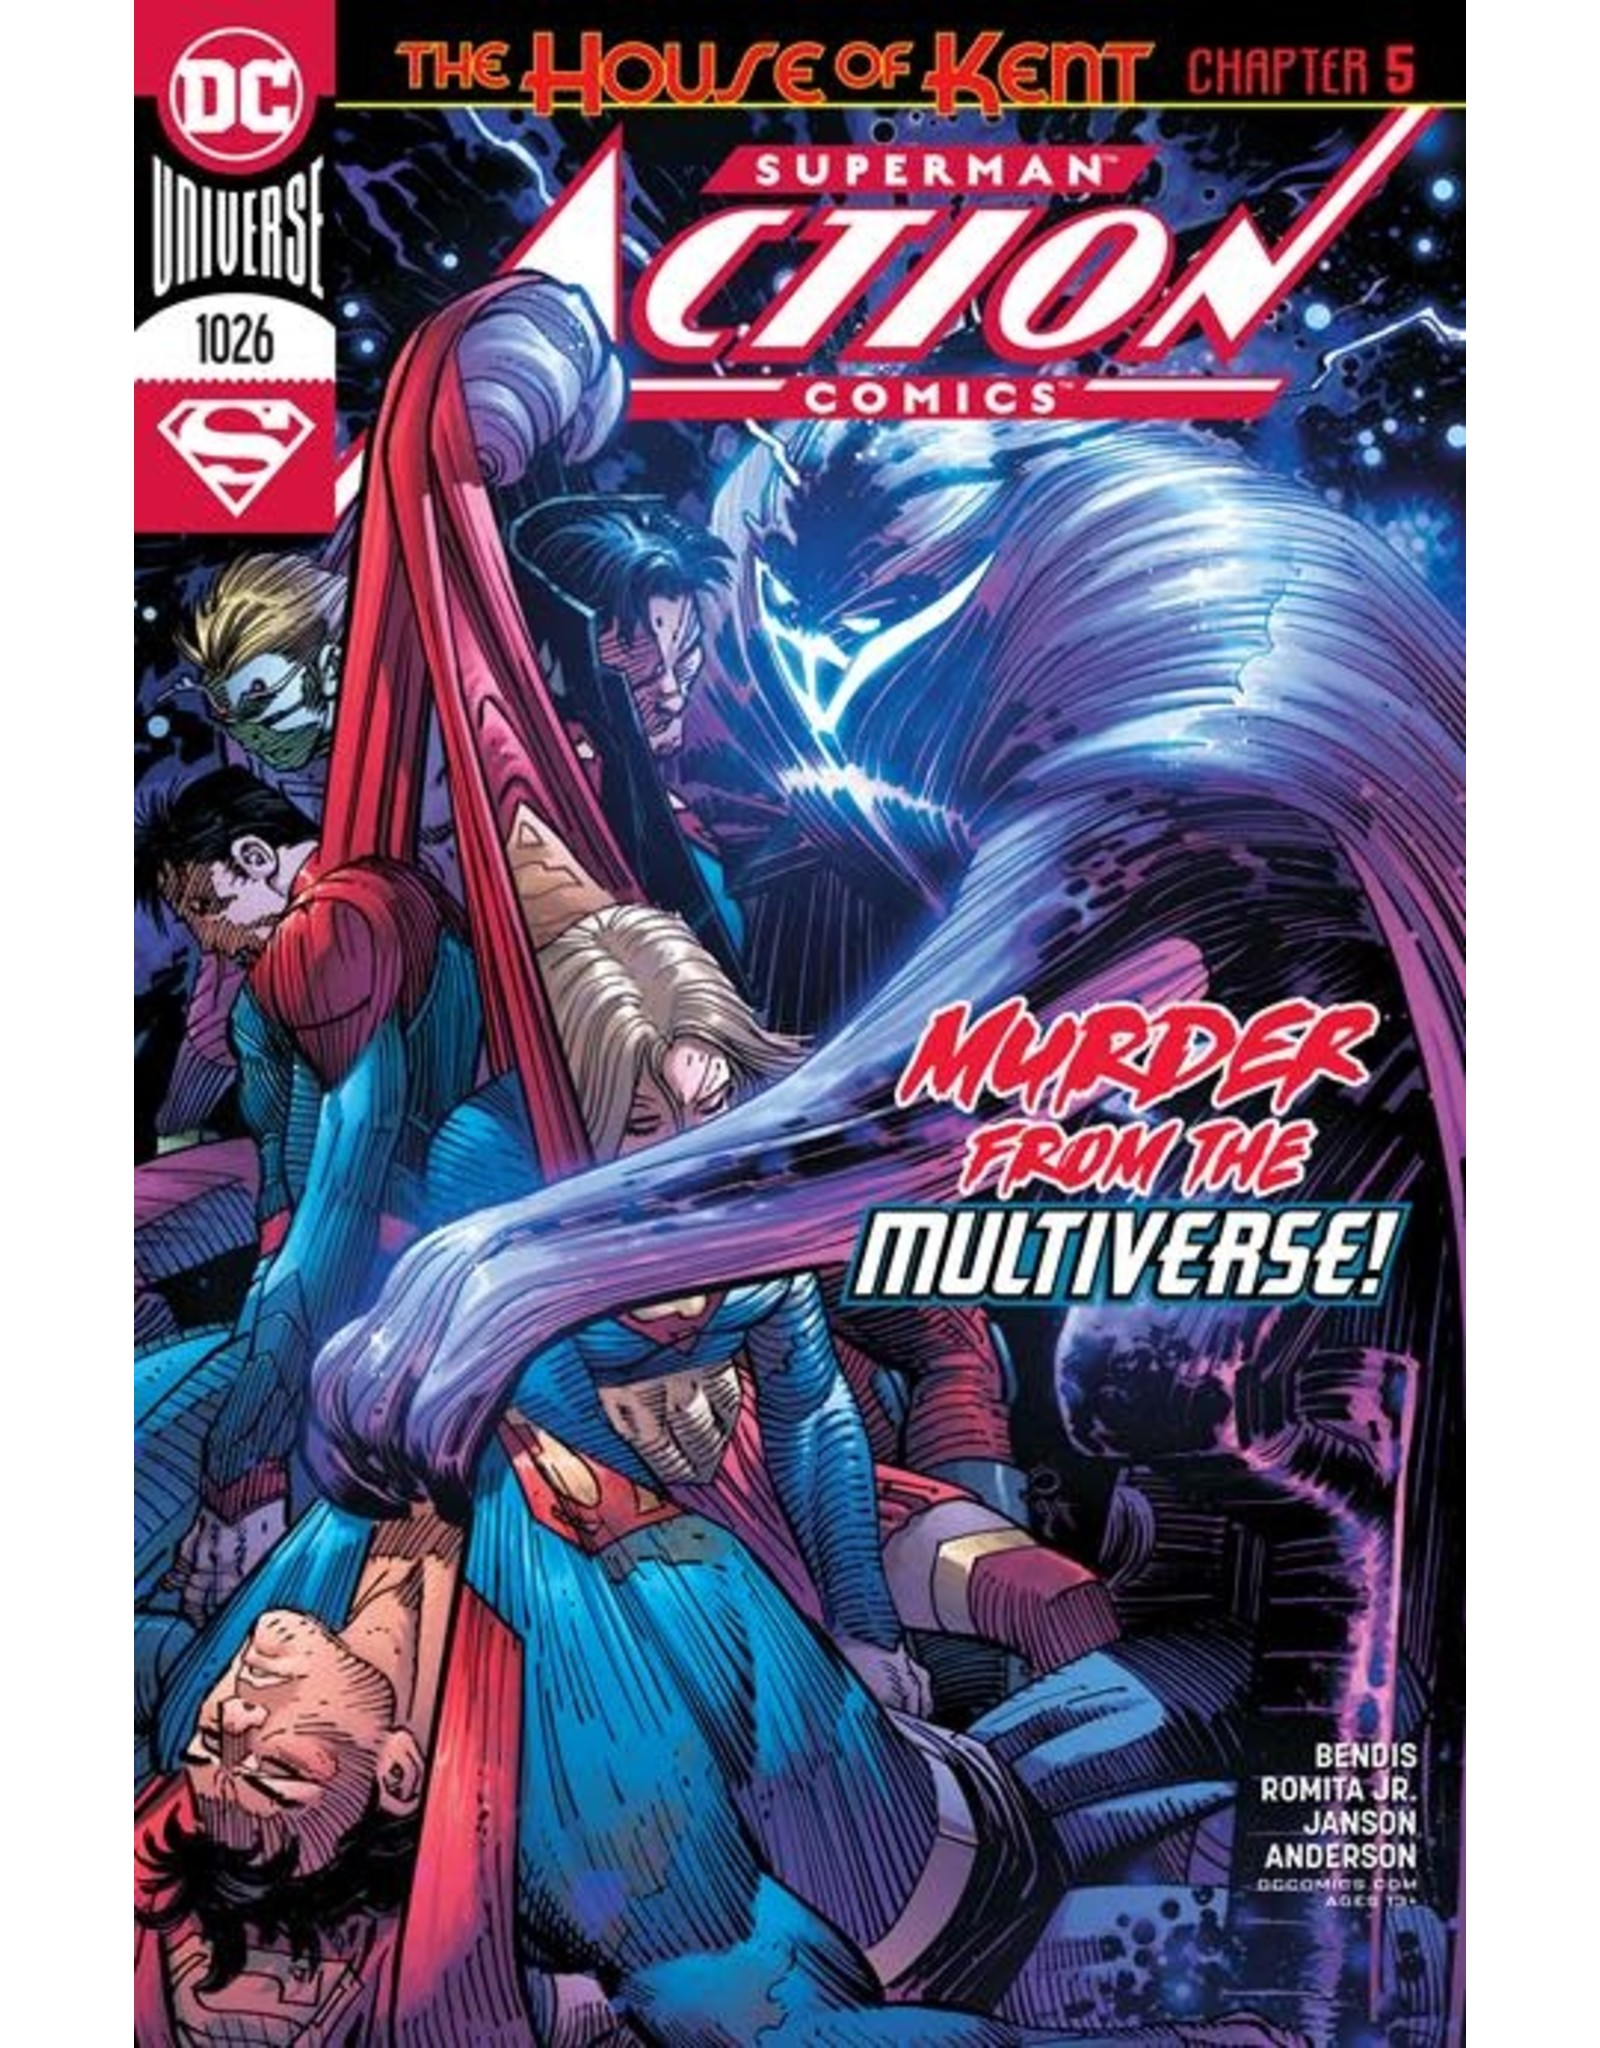 DC Comics ACTION COMICS #1026 CVR A JOHN ROMITA JR & KLAUS JANSON